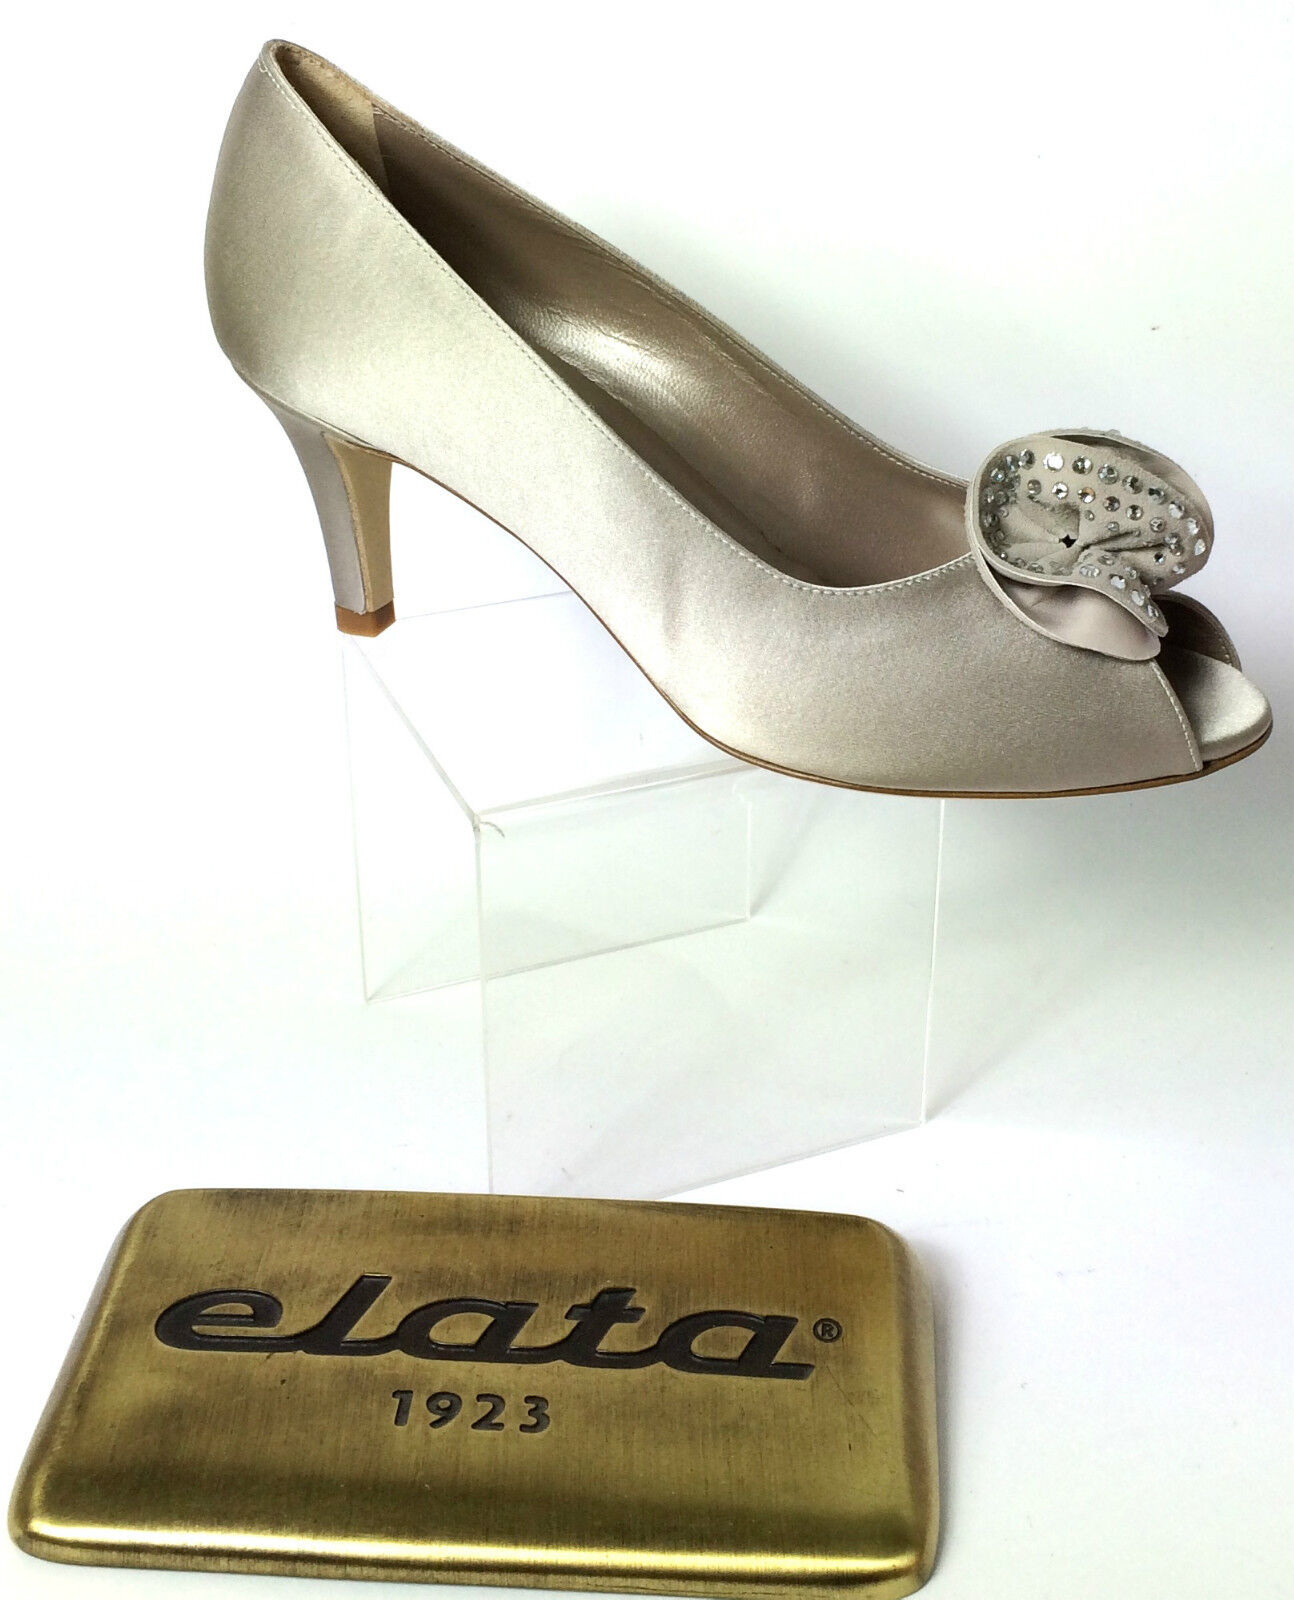 ELATA zapatos mujer SPUNTATE ELEGANTI RASO IN SETA ColorE NUVOLA STRASS H 7 CM